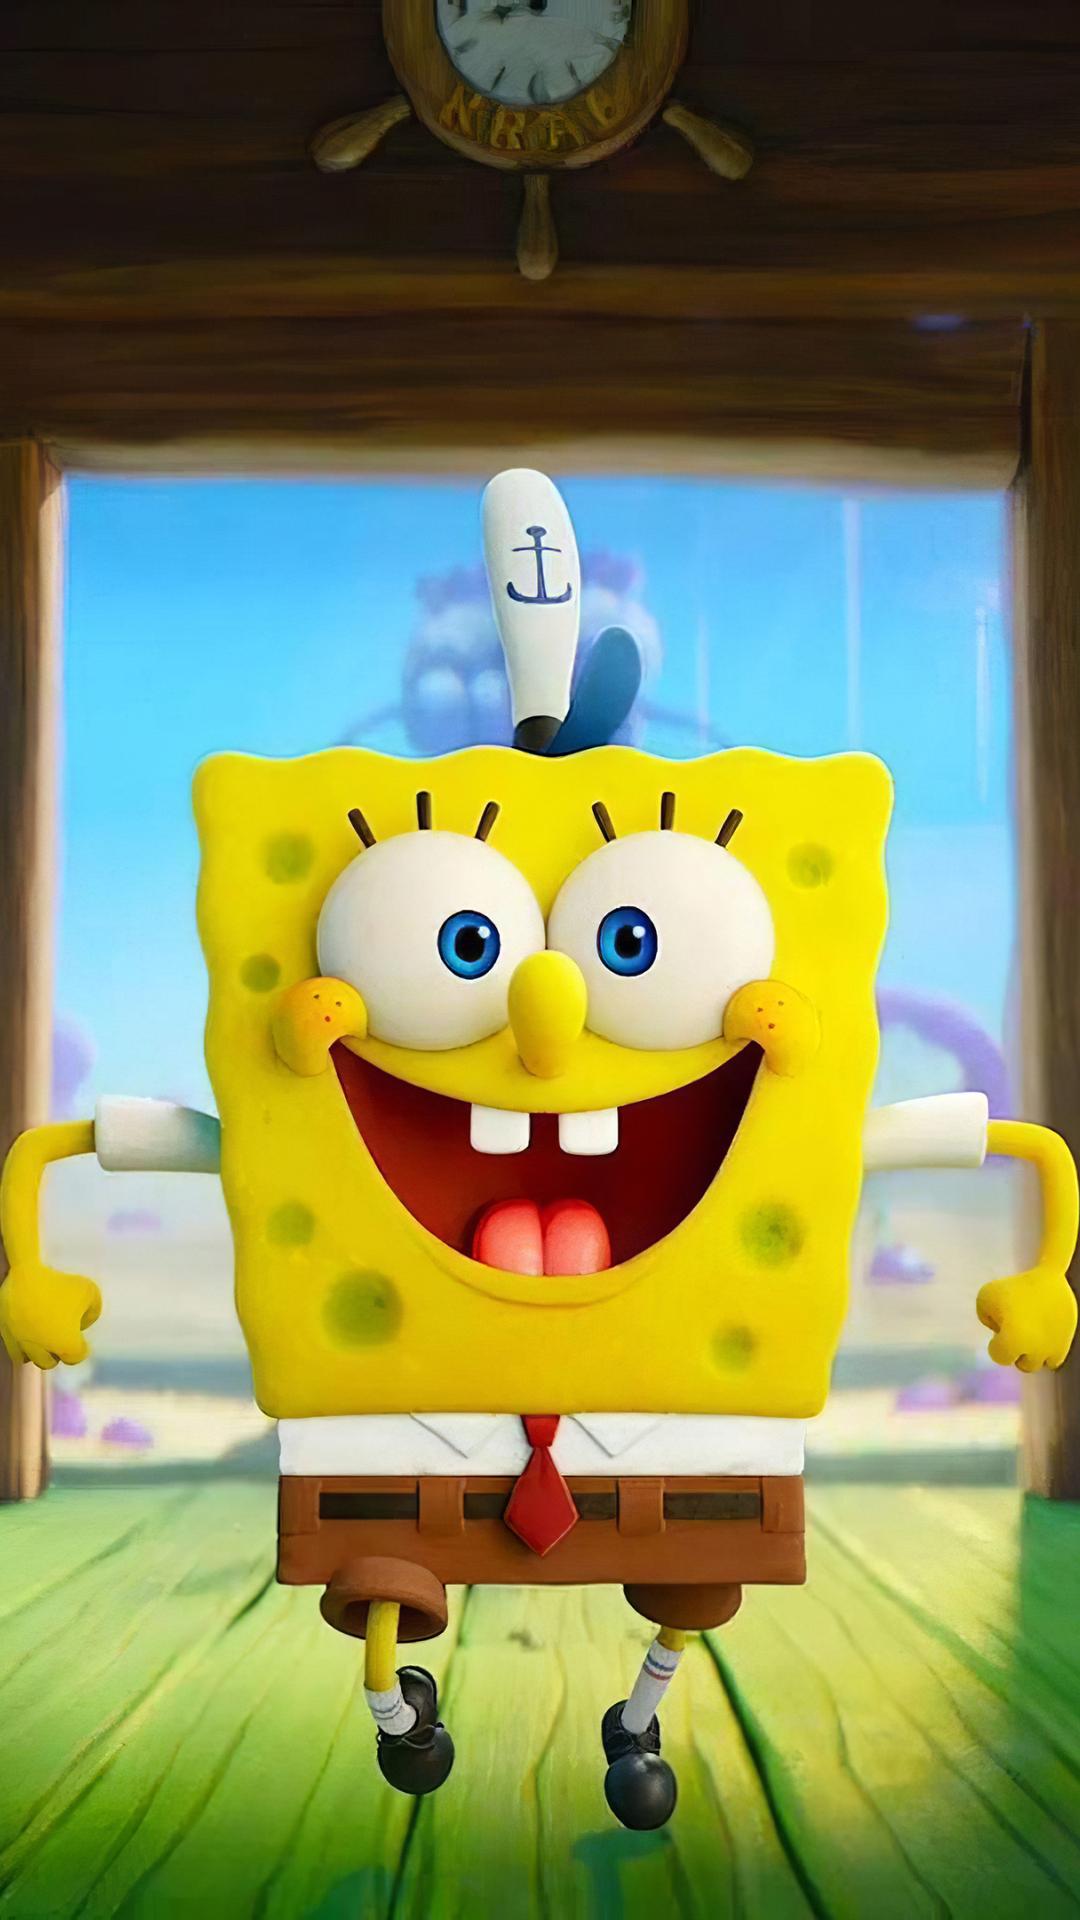 1080x1920 The SpongeBob Movie 4K Iphone 7, 6s, 6 Plus and ...